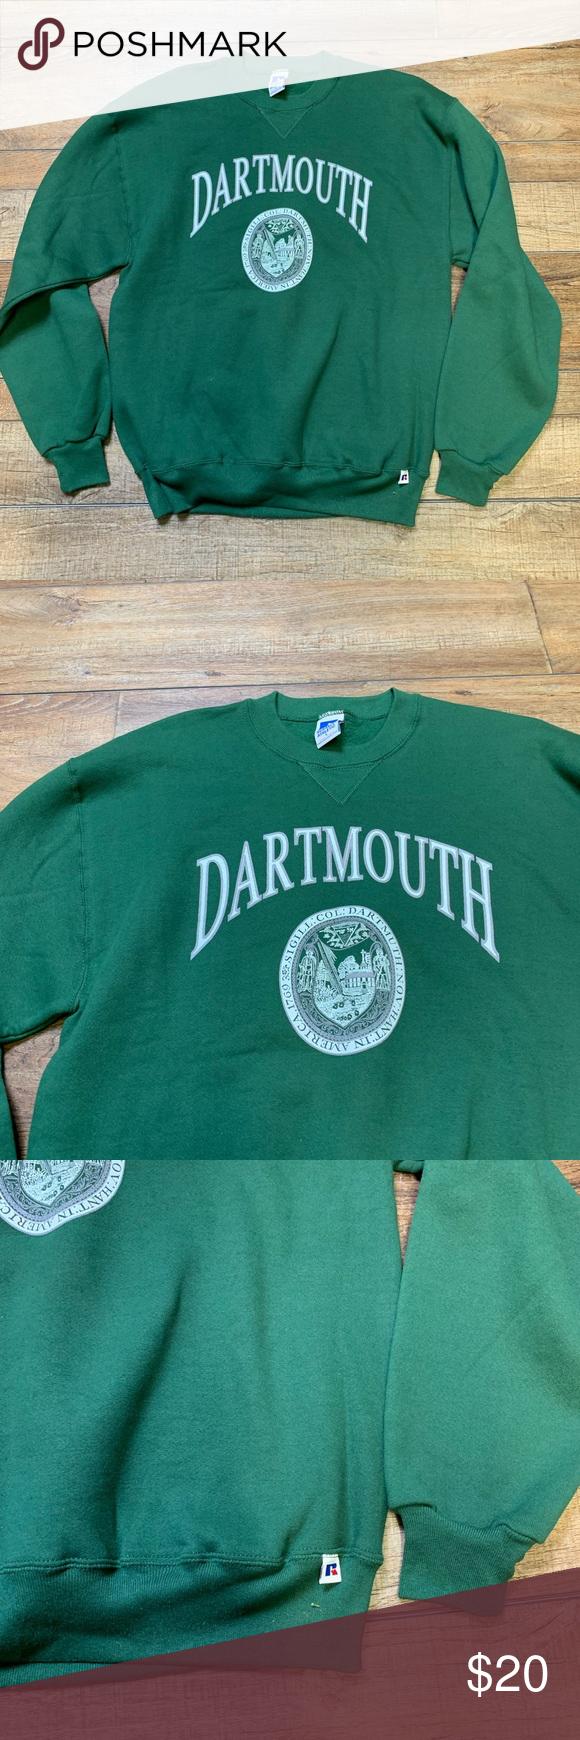 Vintage Dartmouth University College Sweatshirt Brand New No Tags Never Worn Authentic Official Russ Sweatshirts College Sweatshirt Branded Sweatshirts [ 1740 x 580 Pixel ]